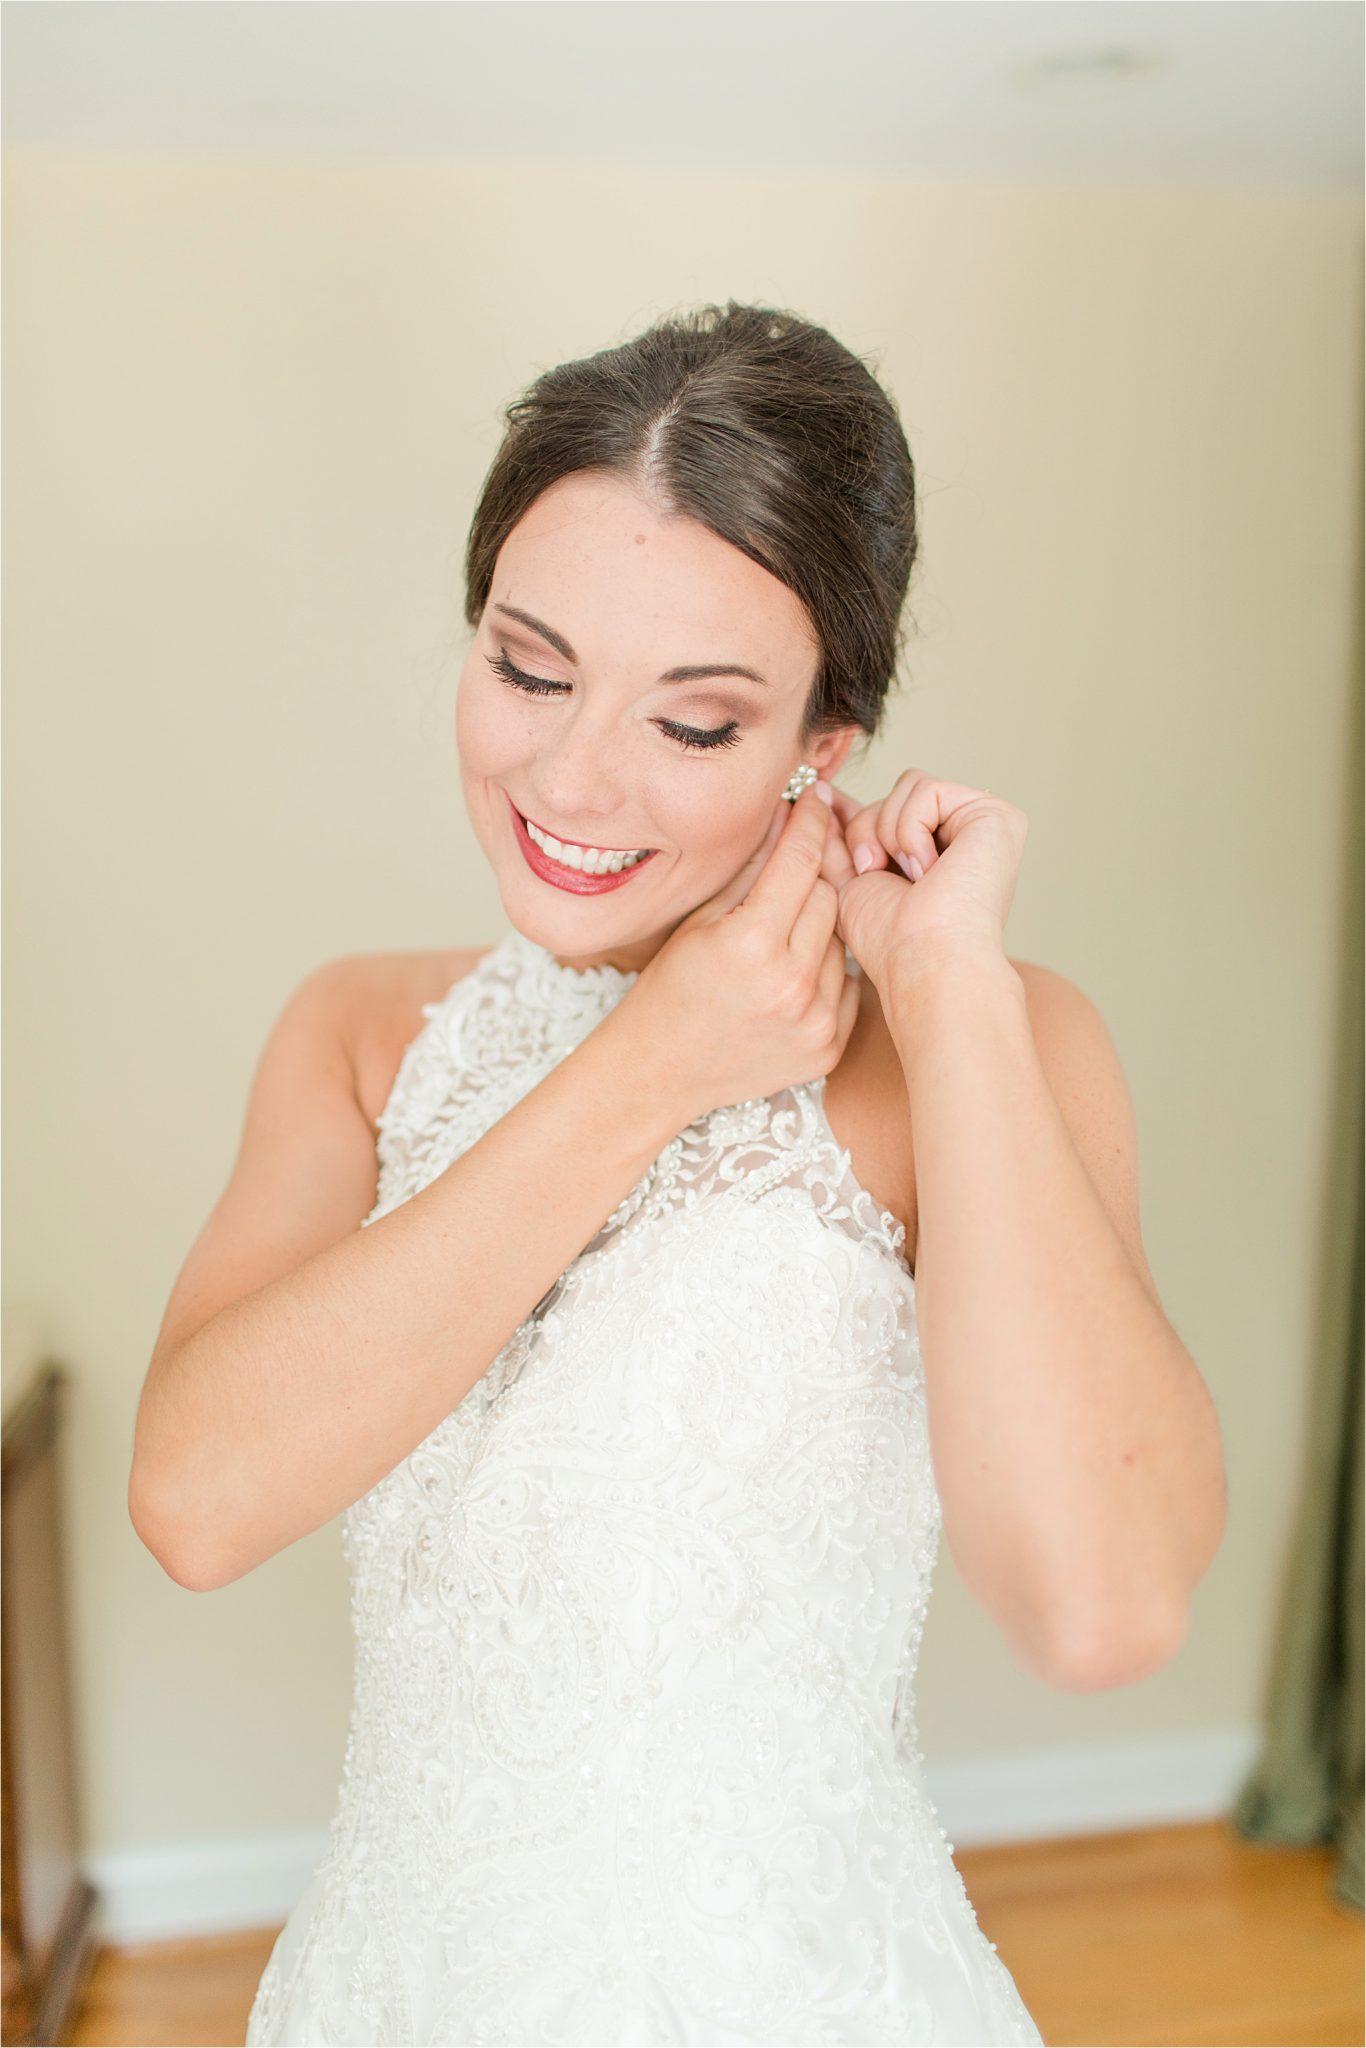 Sonnet House, Birmingham Alabama Wedding Photographer, Wedding dress